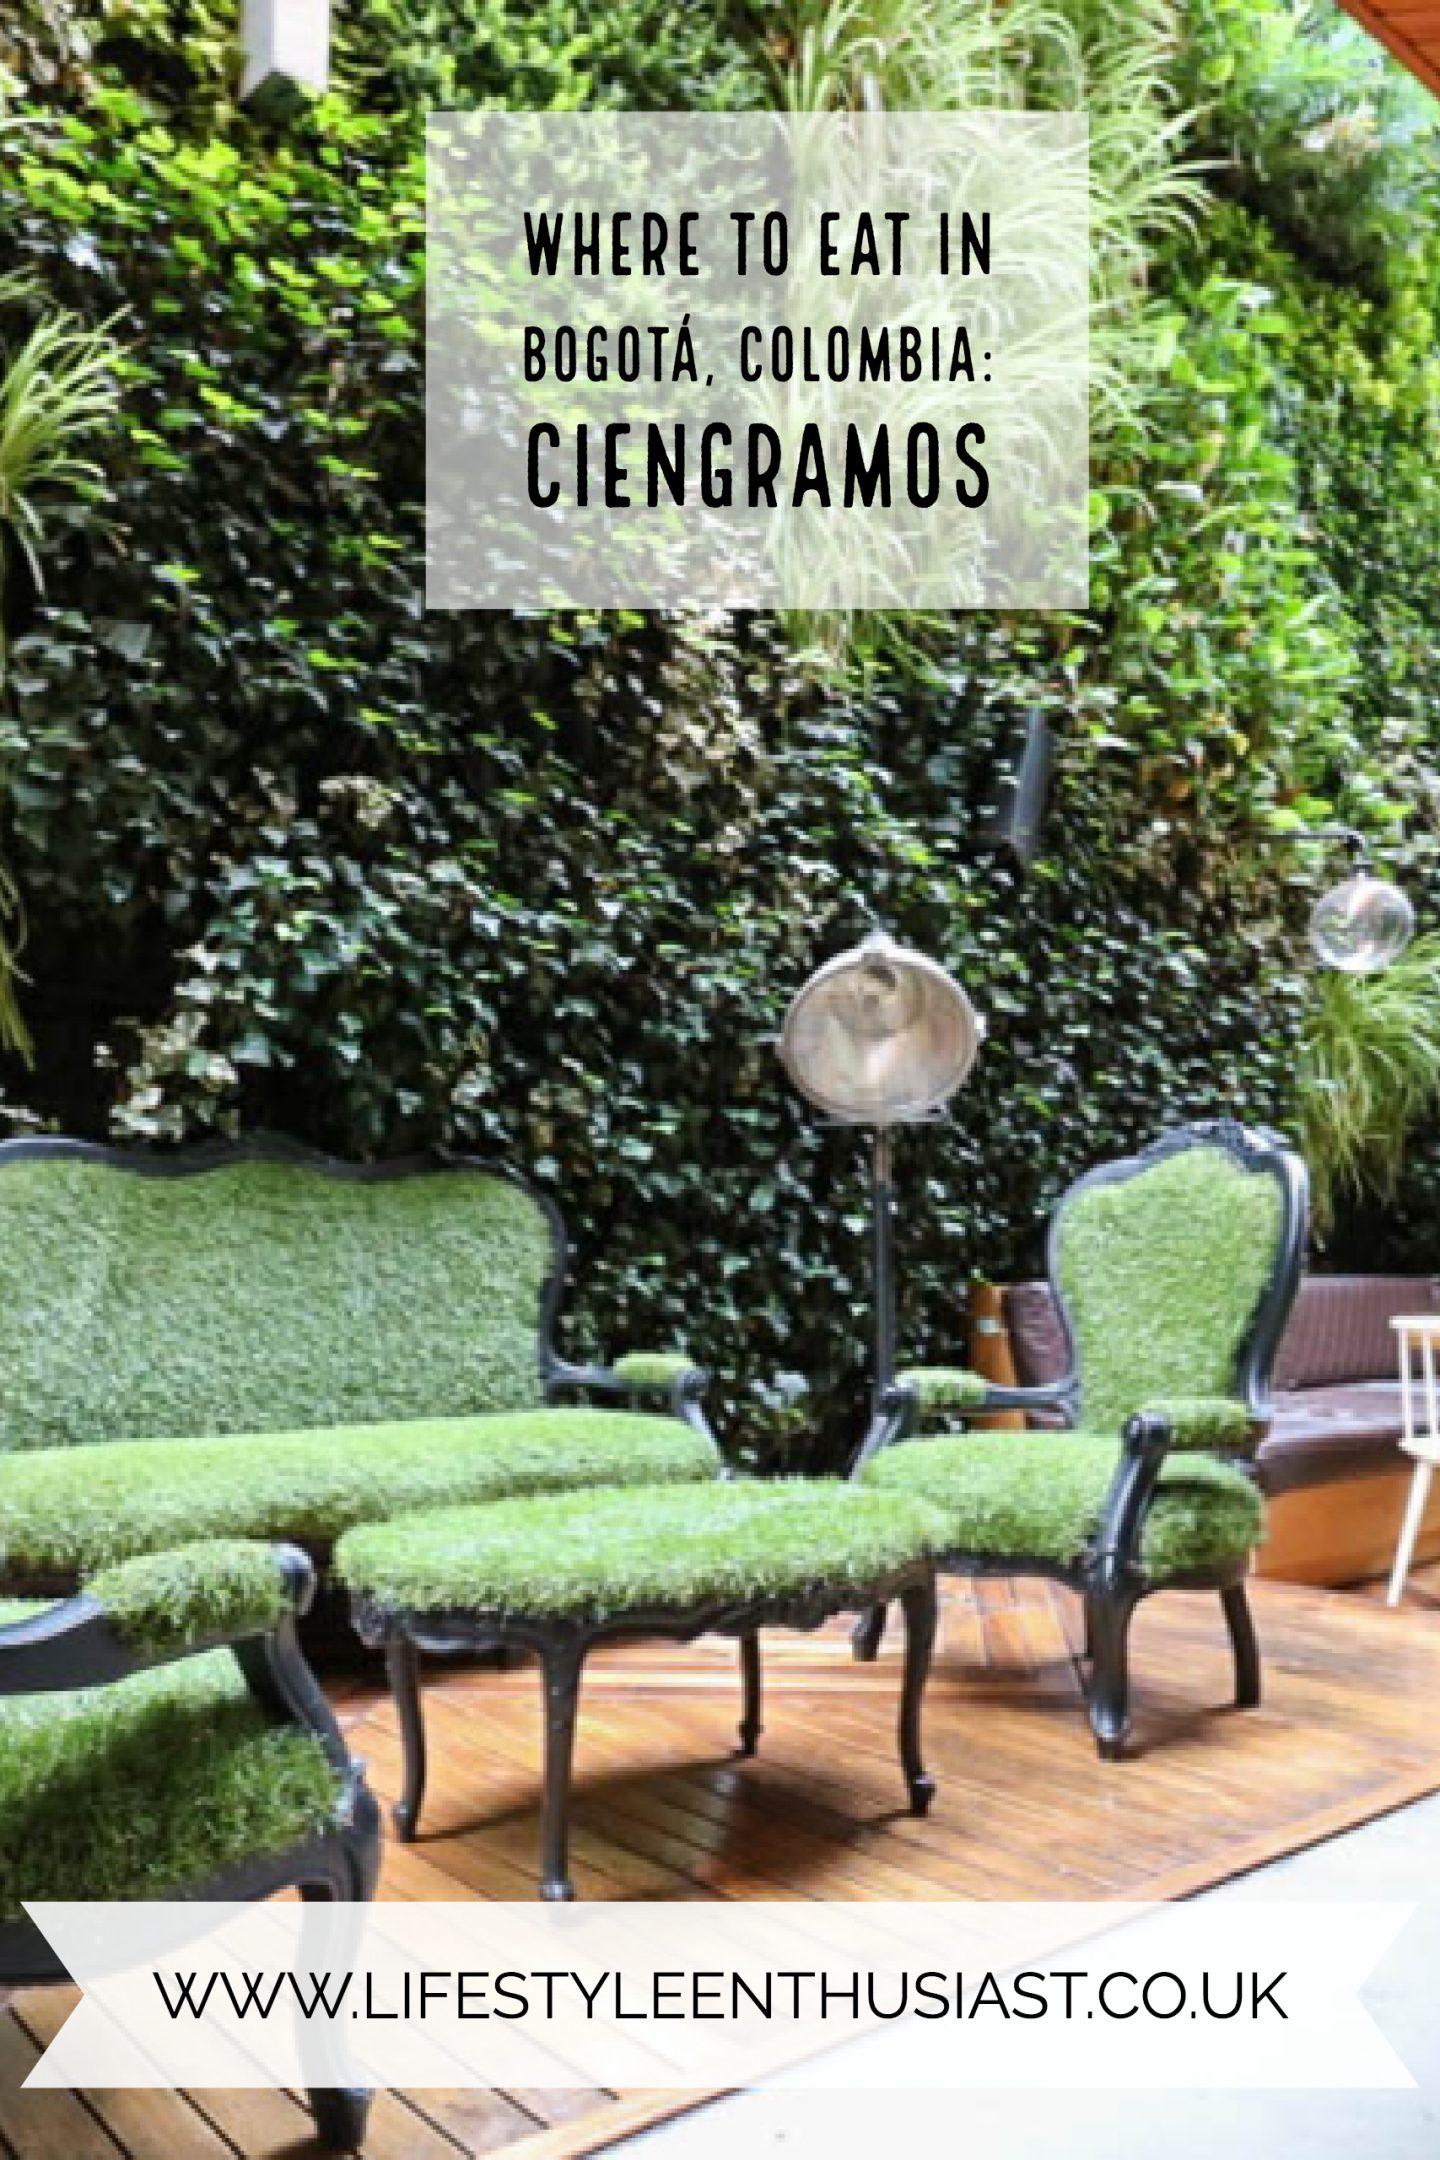 Ciengramos at Click Clack Hotel, Bogota, Colombia.